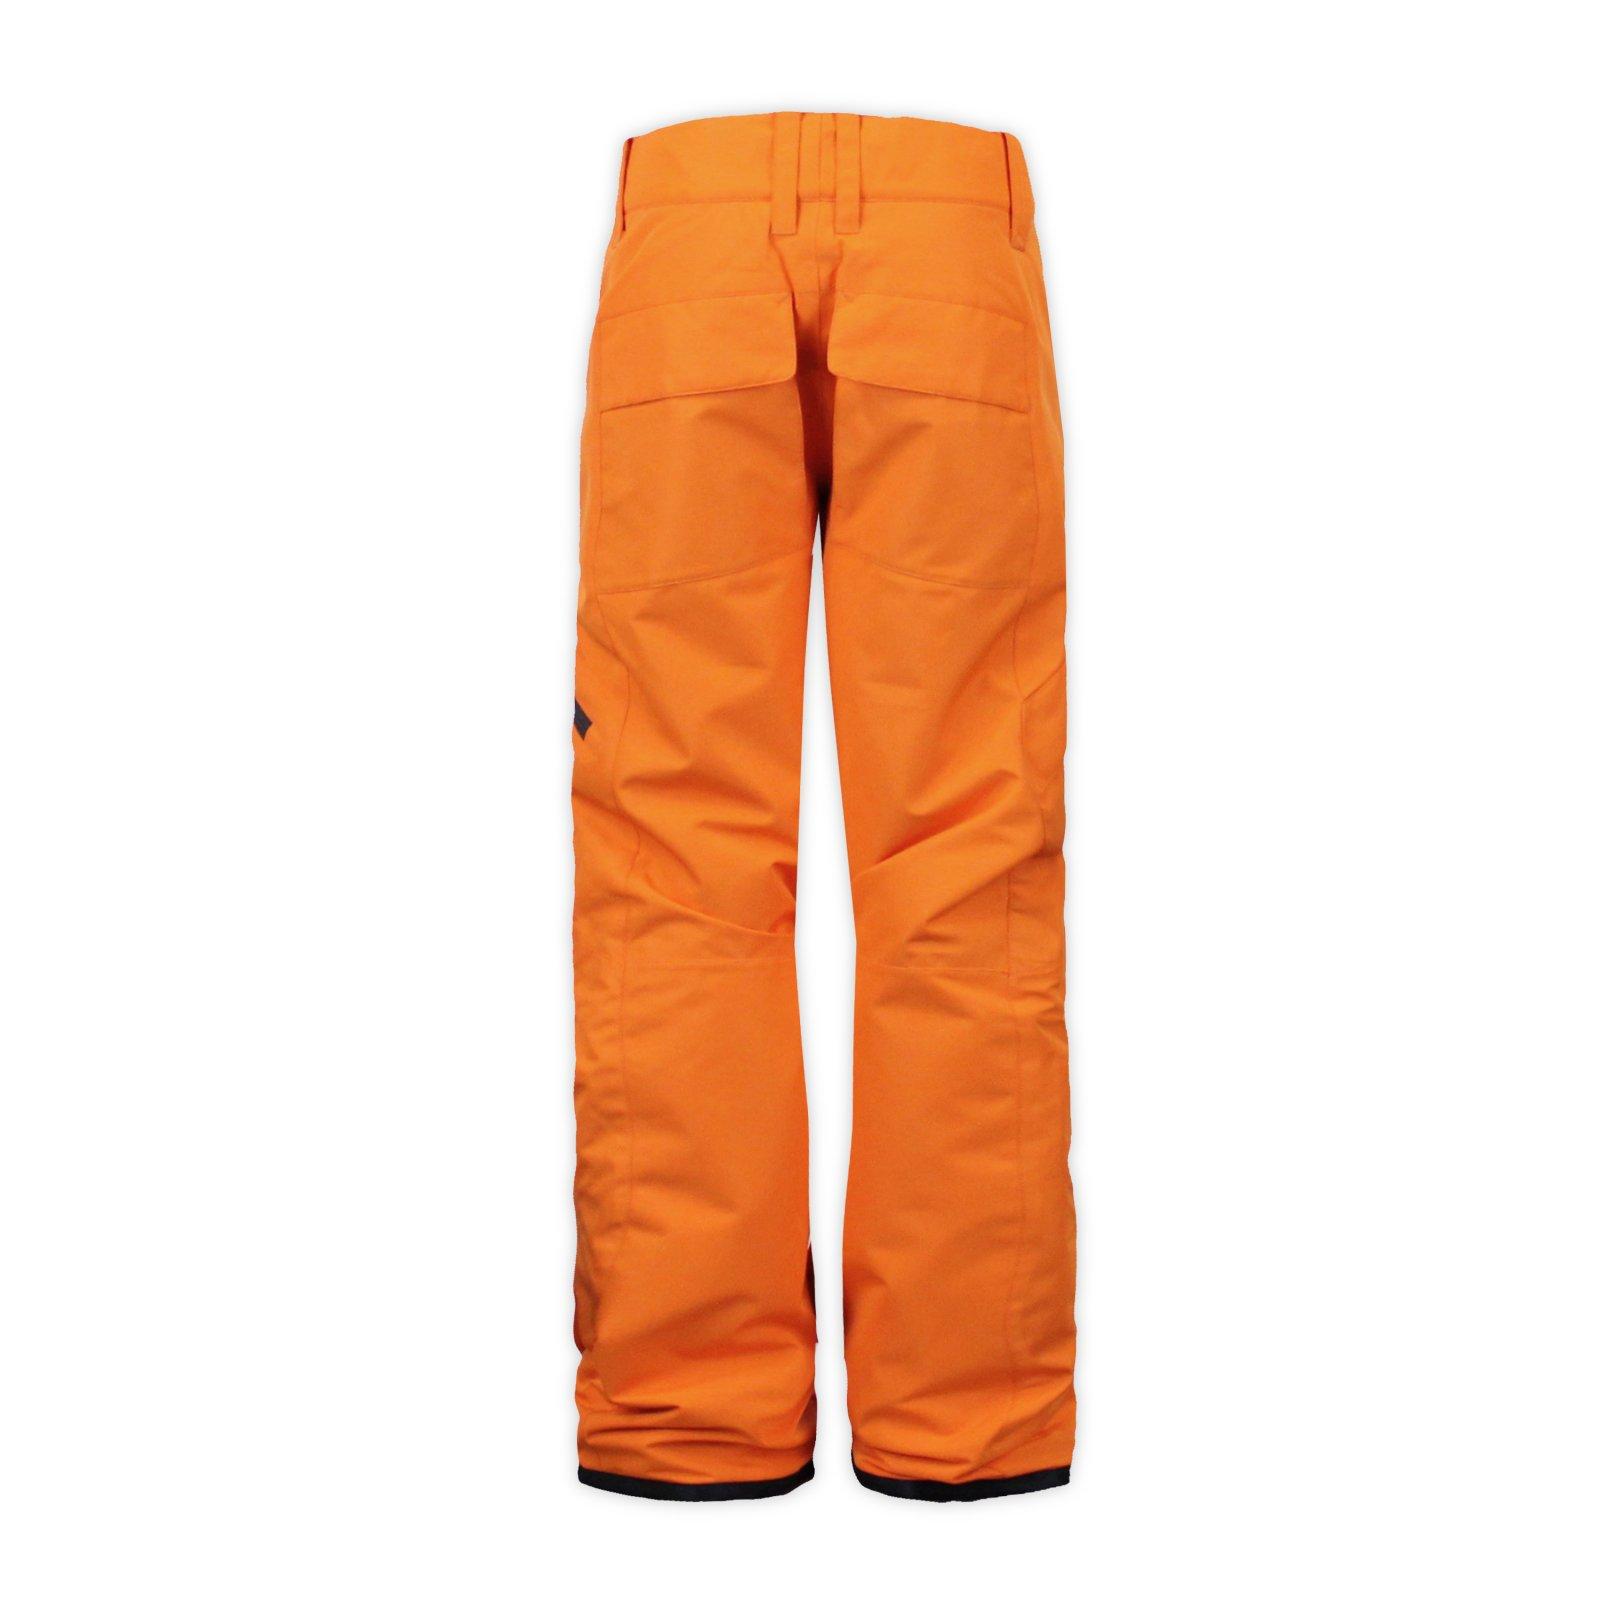 Boulder Gear Boy's Bolt Pant